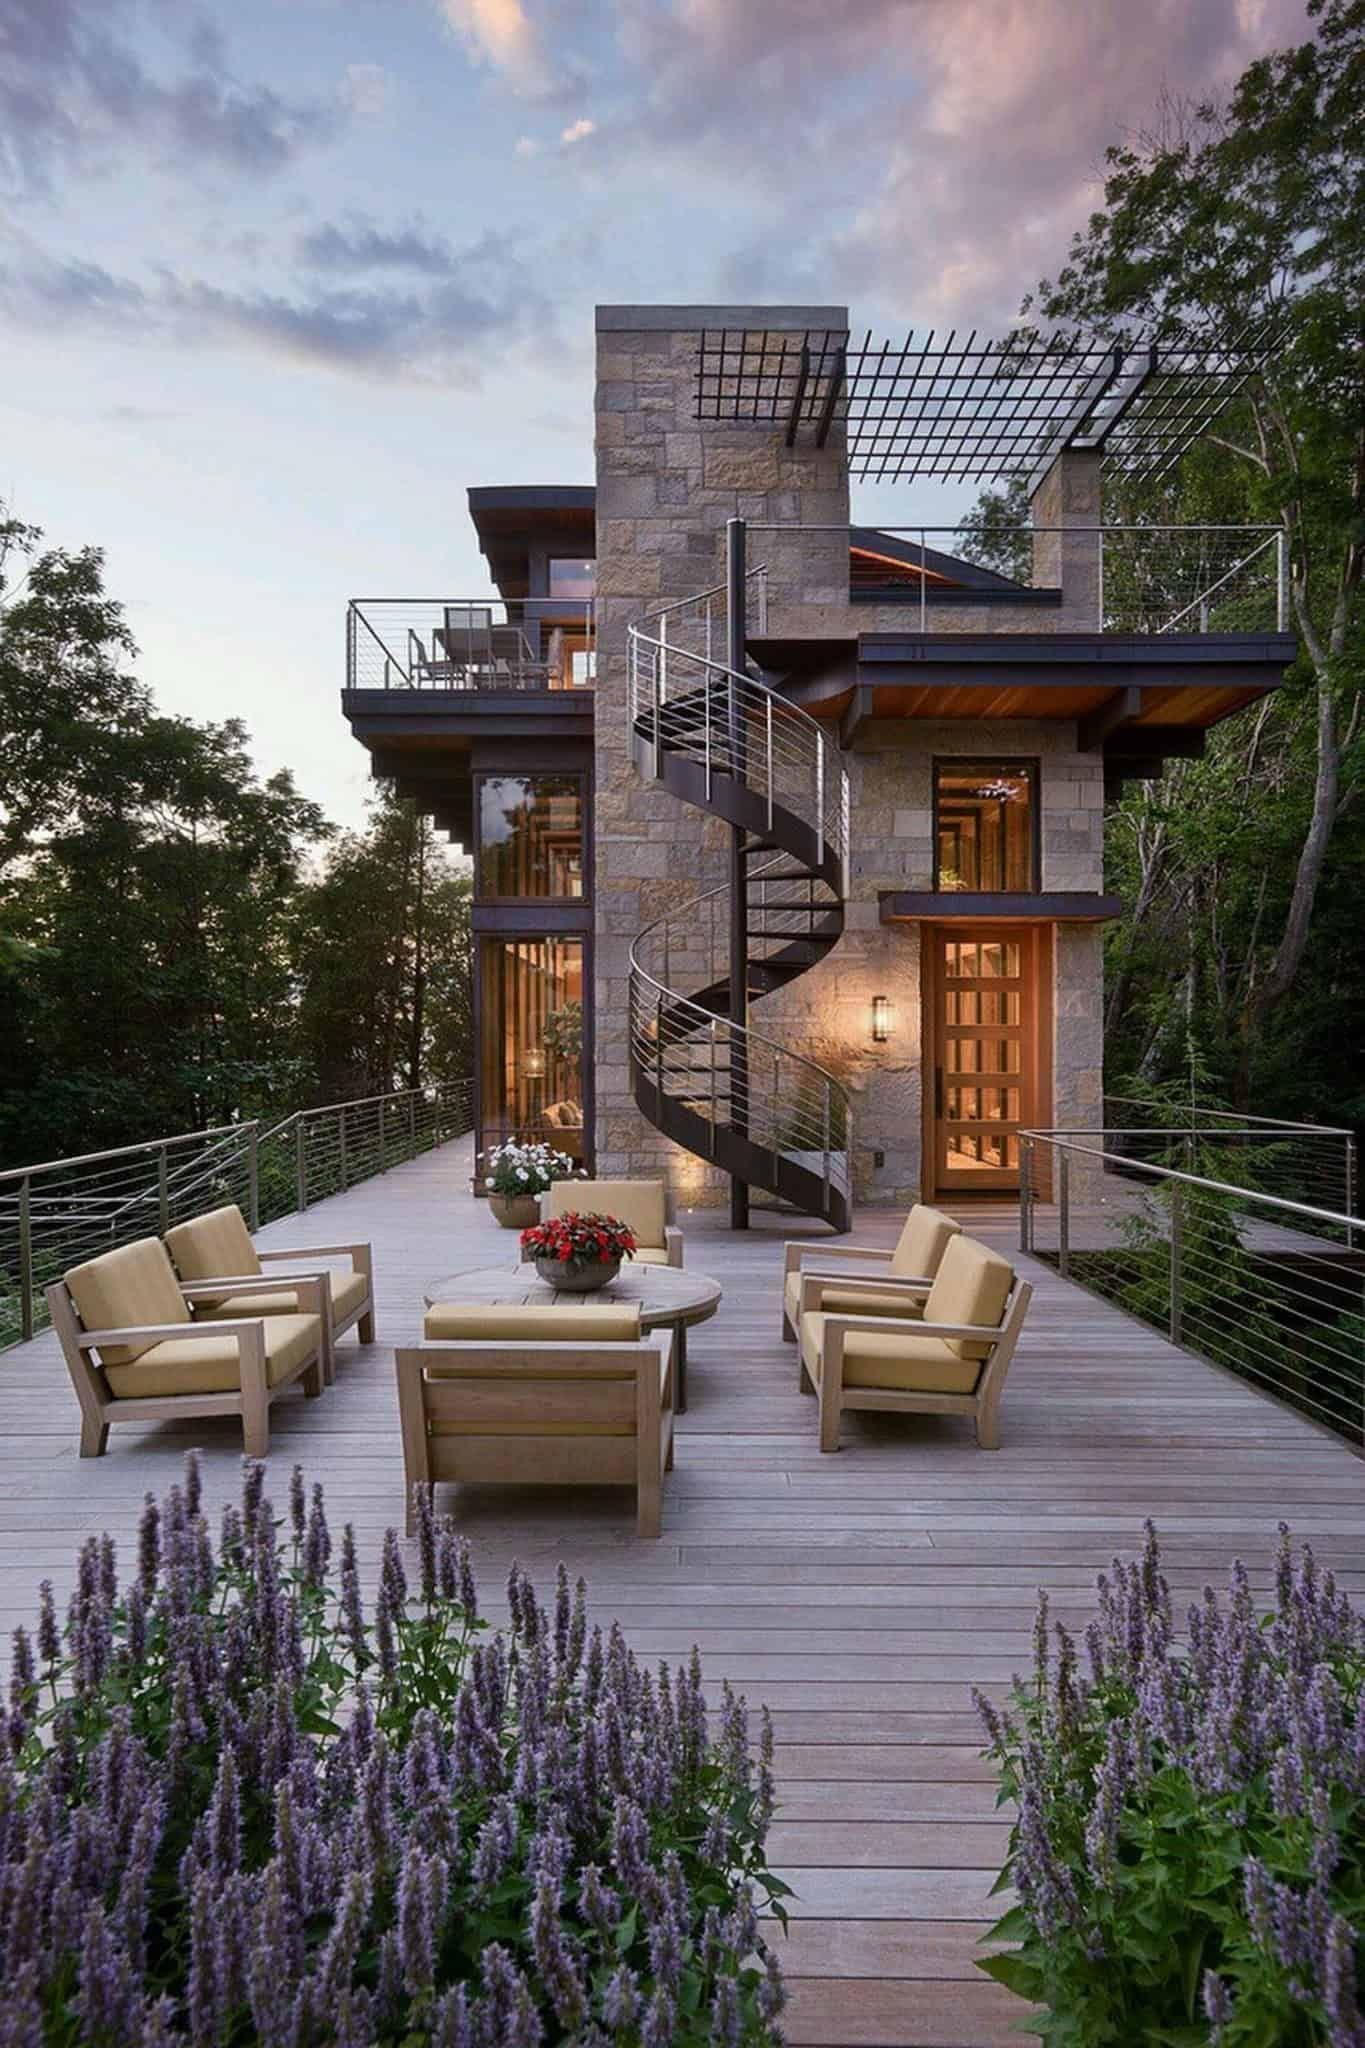 Modern treetop home boasts mesmerizing views over